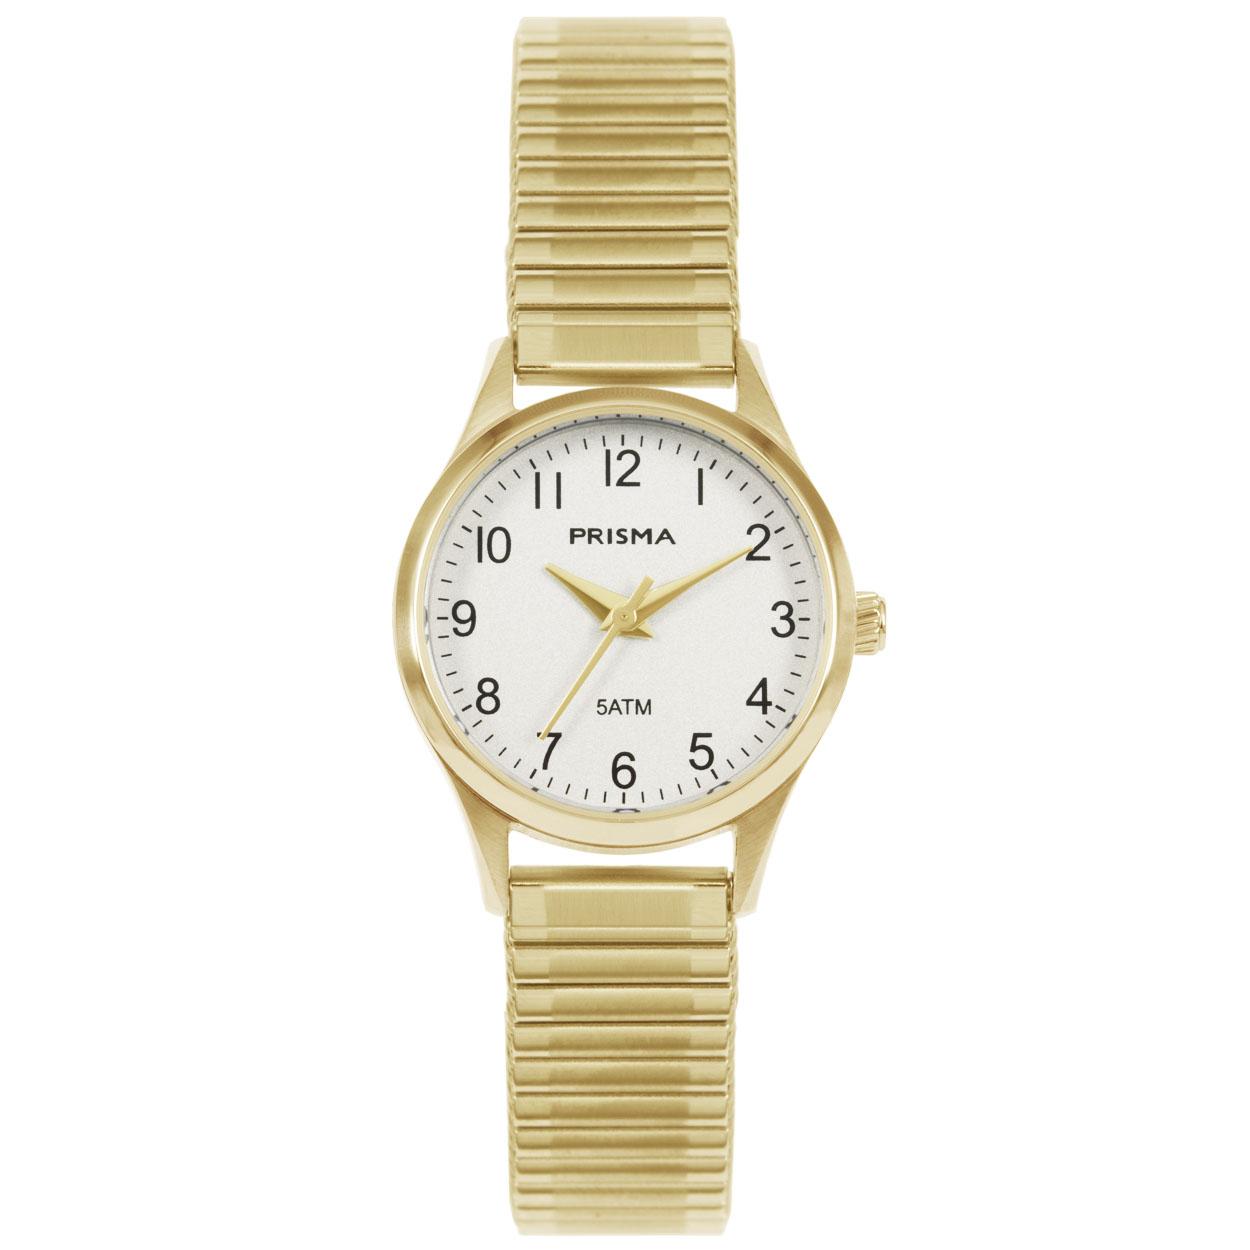 Prisma P.1172 Horloge Rekband staal goudkleurig 25 mm